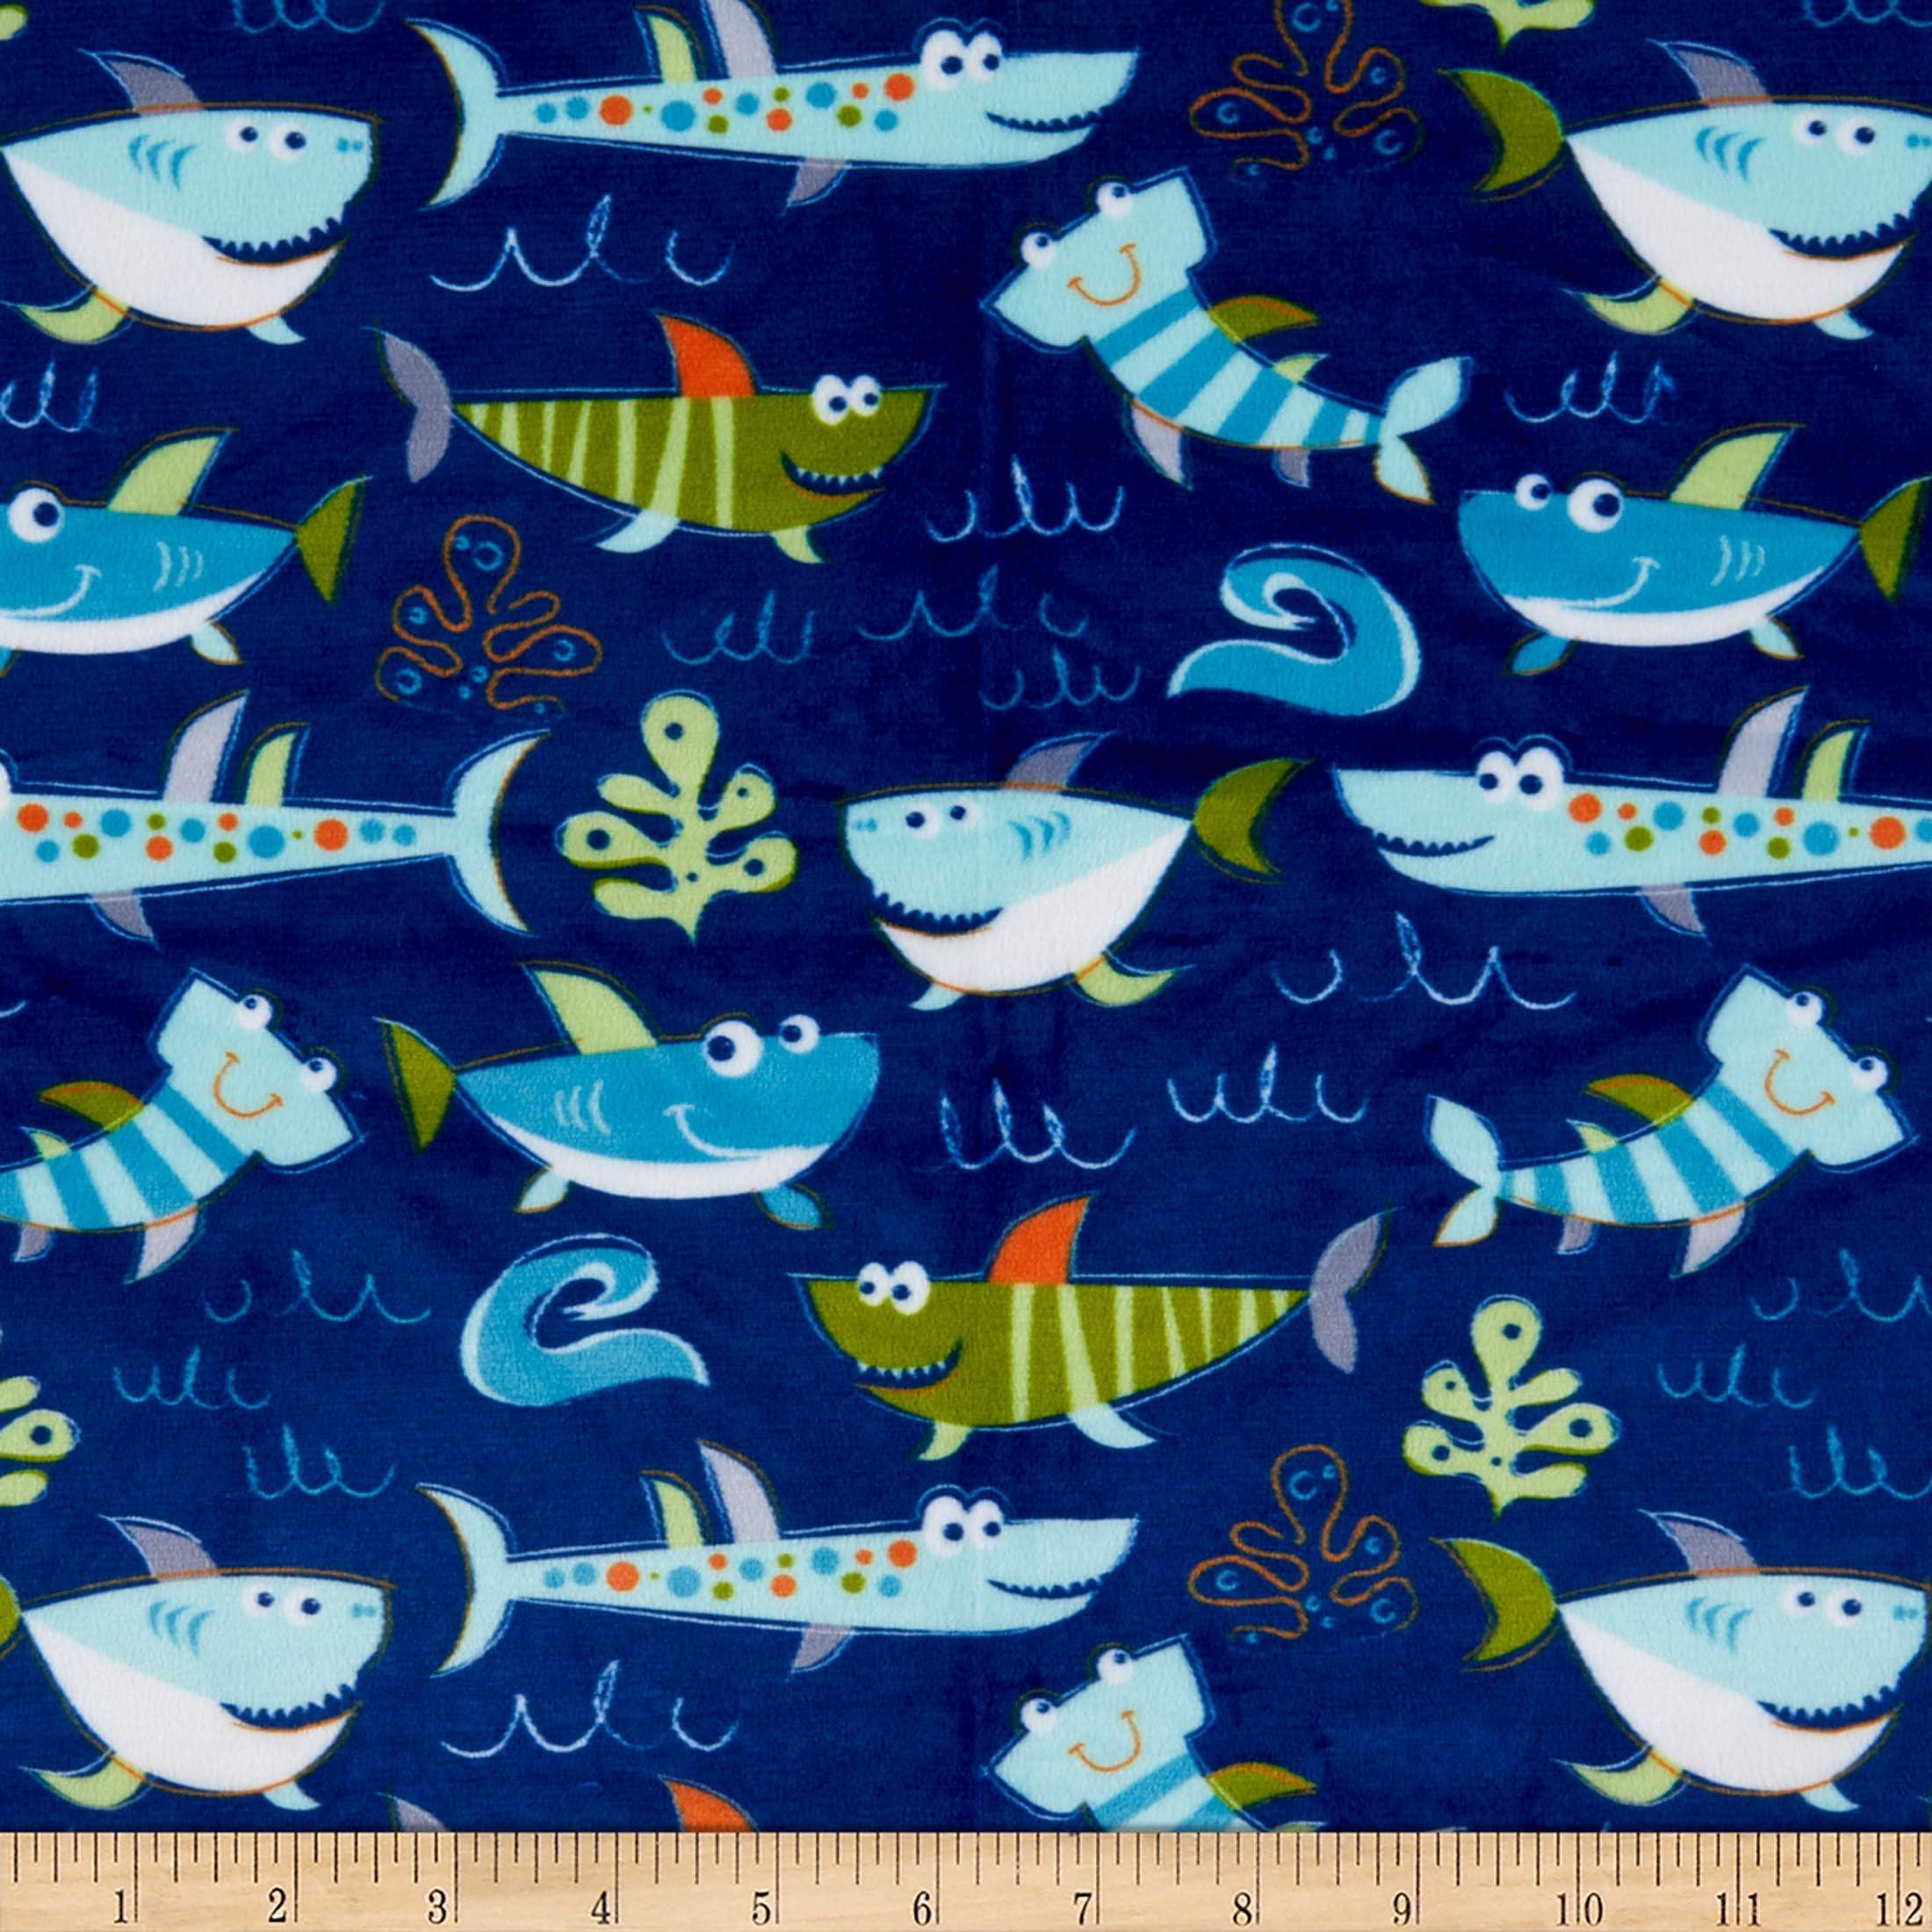 QT461 Quilting Treasures Dream Boat Ocean Fish Ocean Aqua 100/% cotton Fabric by the yard 36x43 Fish Fabric Cartoon Fabric